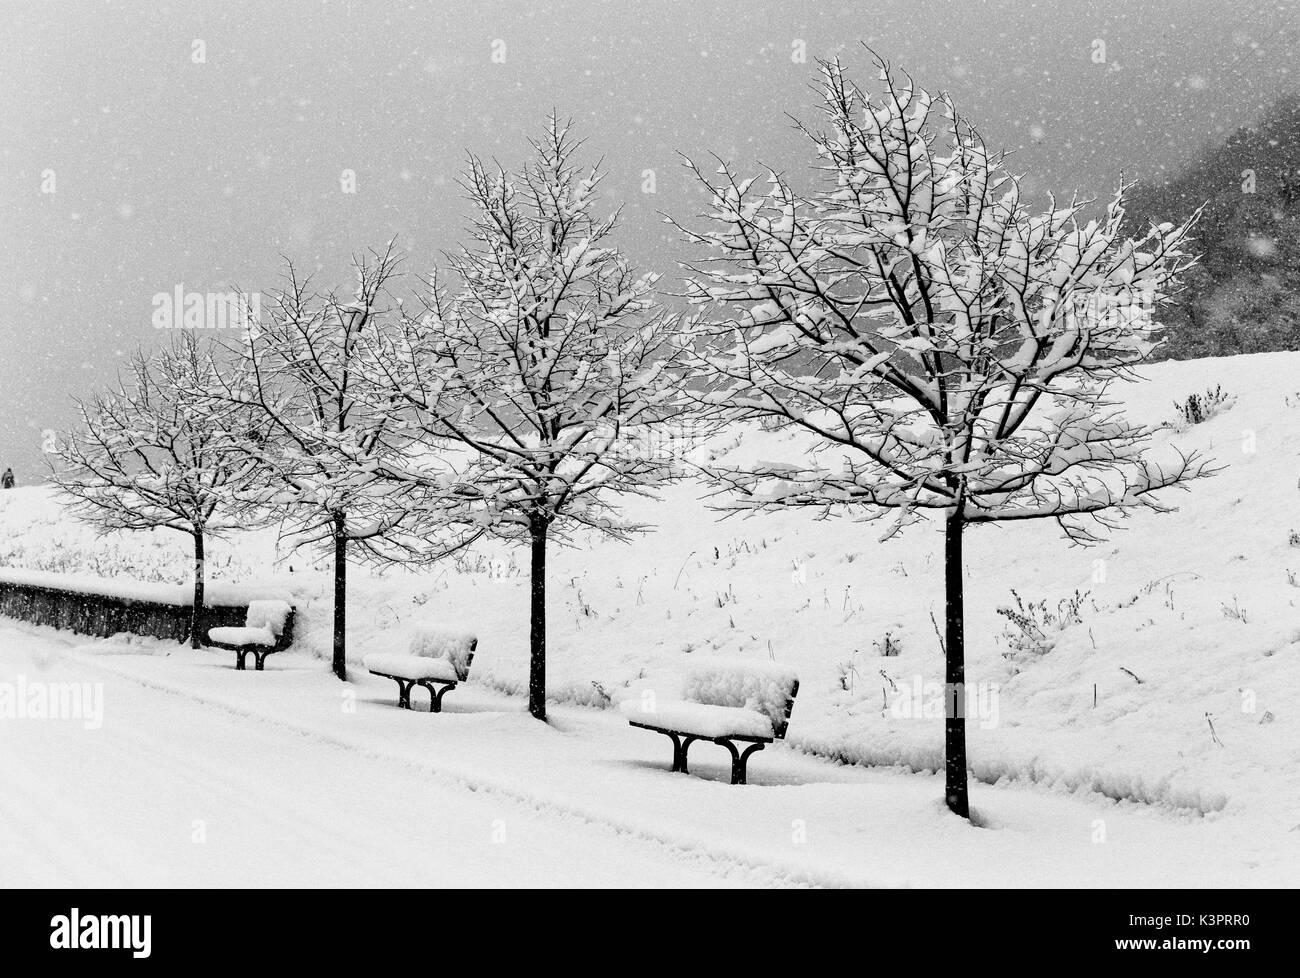 Snow fall in Siria Forcola, Valtellina, Lombardy, Italy - Stock Image